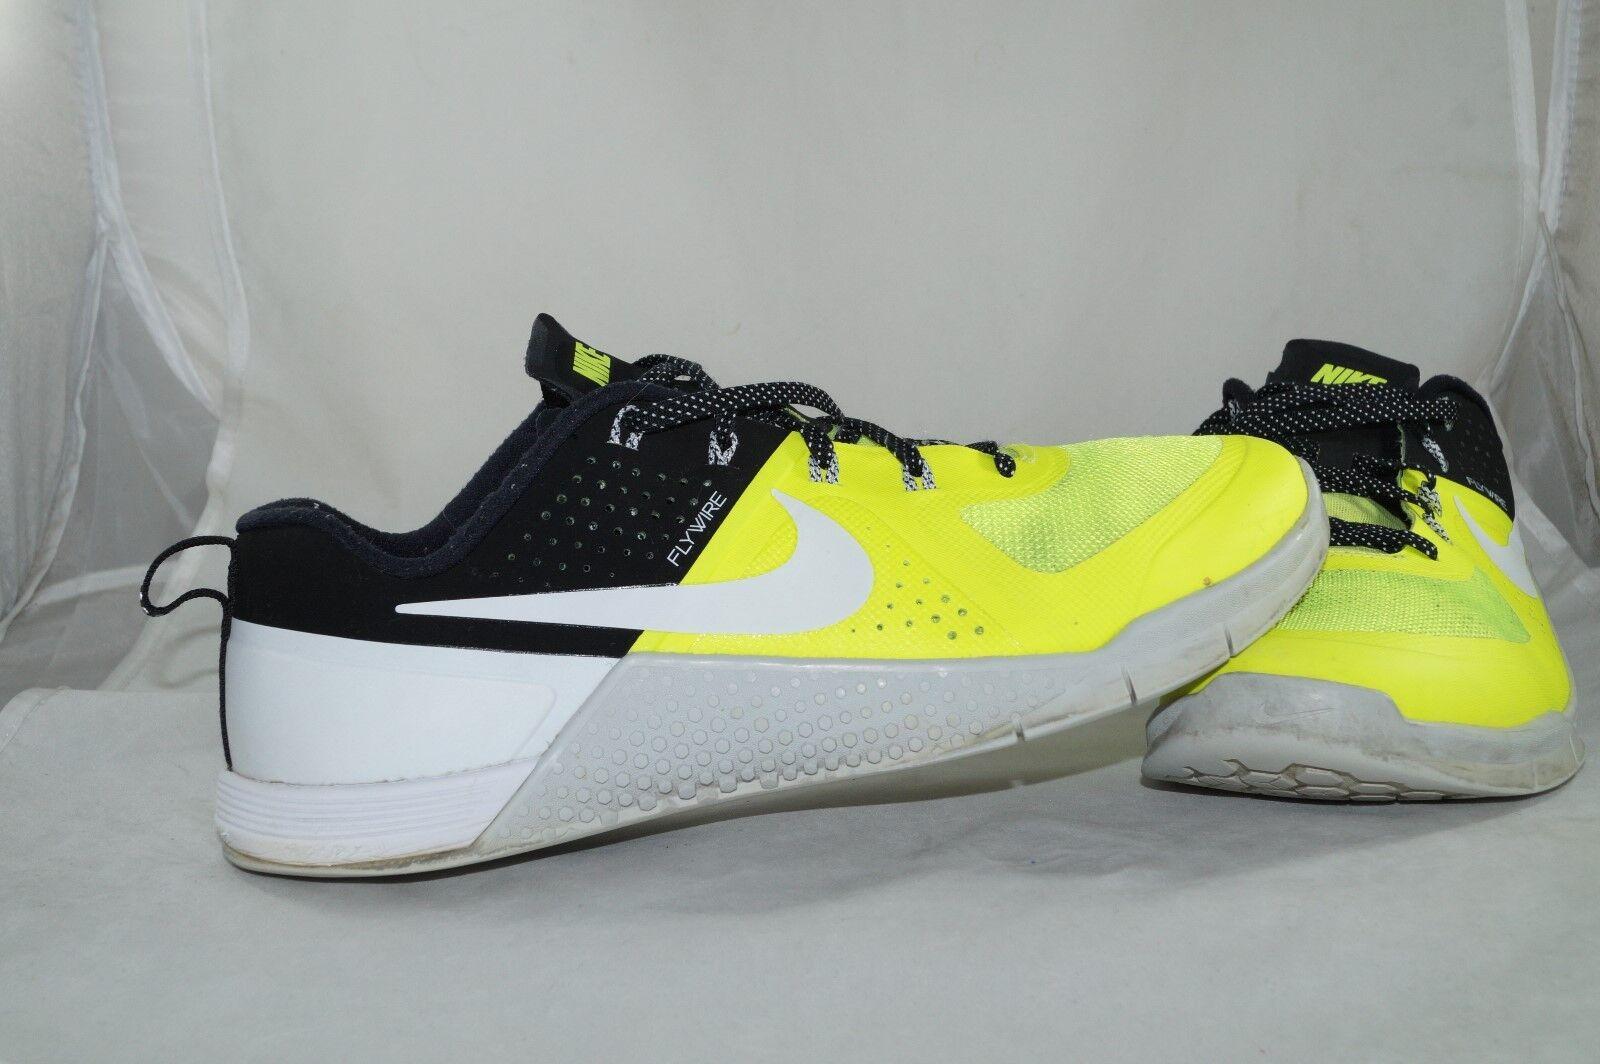 Nike Metcon 1 Trainers GR: 43 Sportschuhe Flywire Neongelb